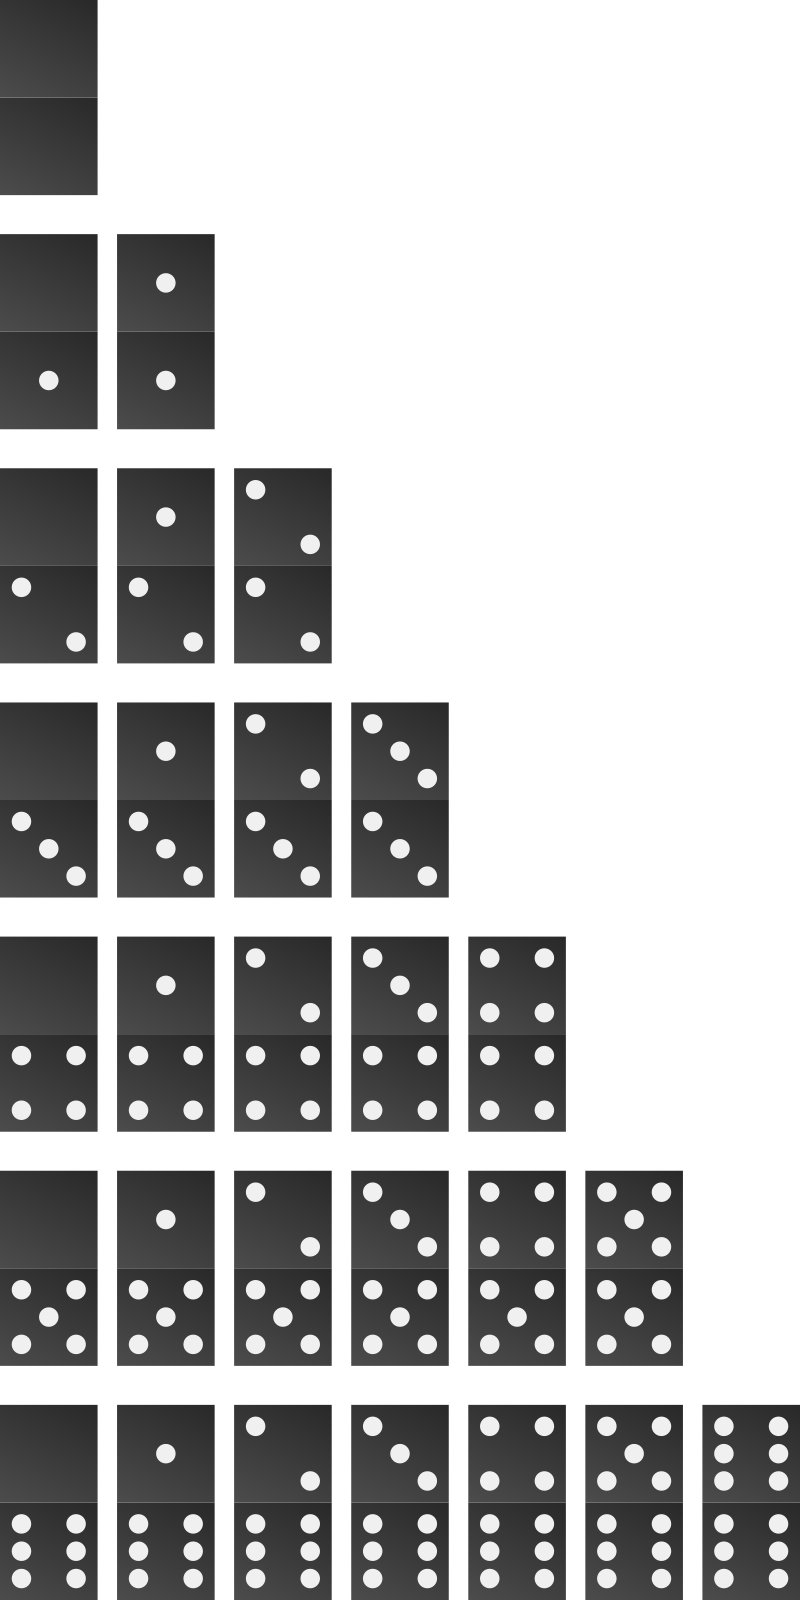 Game clipart outdoor game. Dominomatrix domino wikipedia games